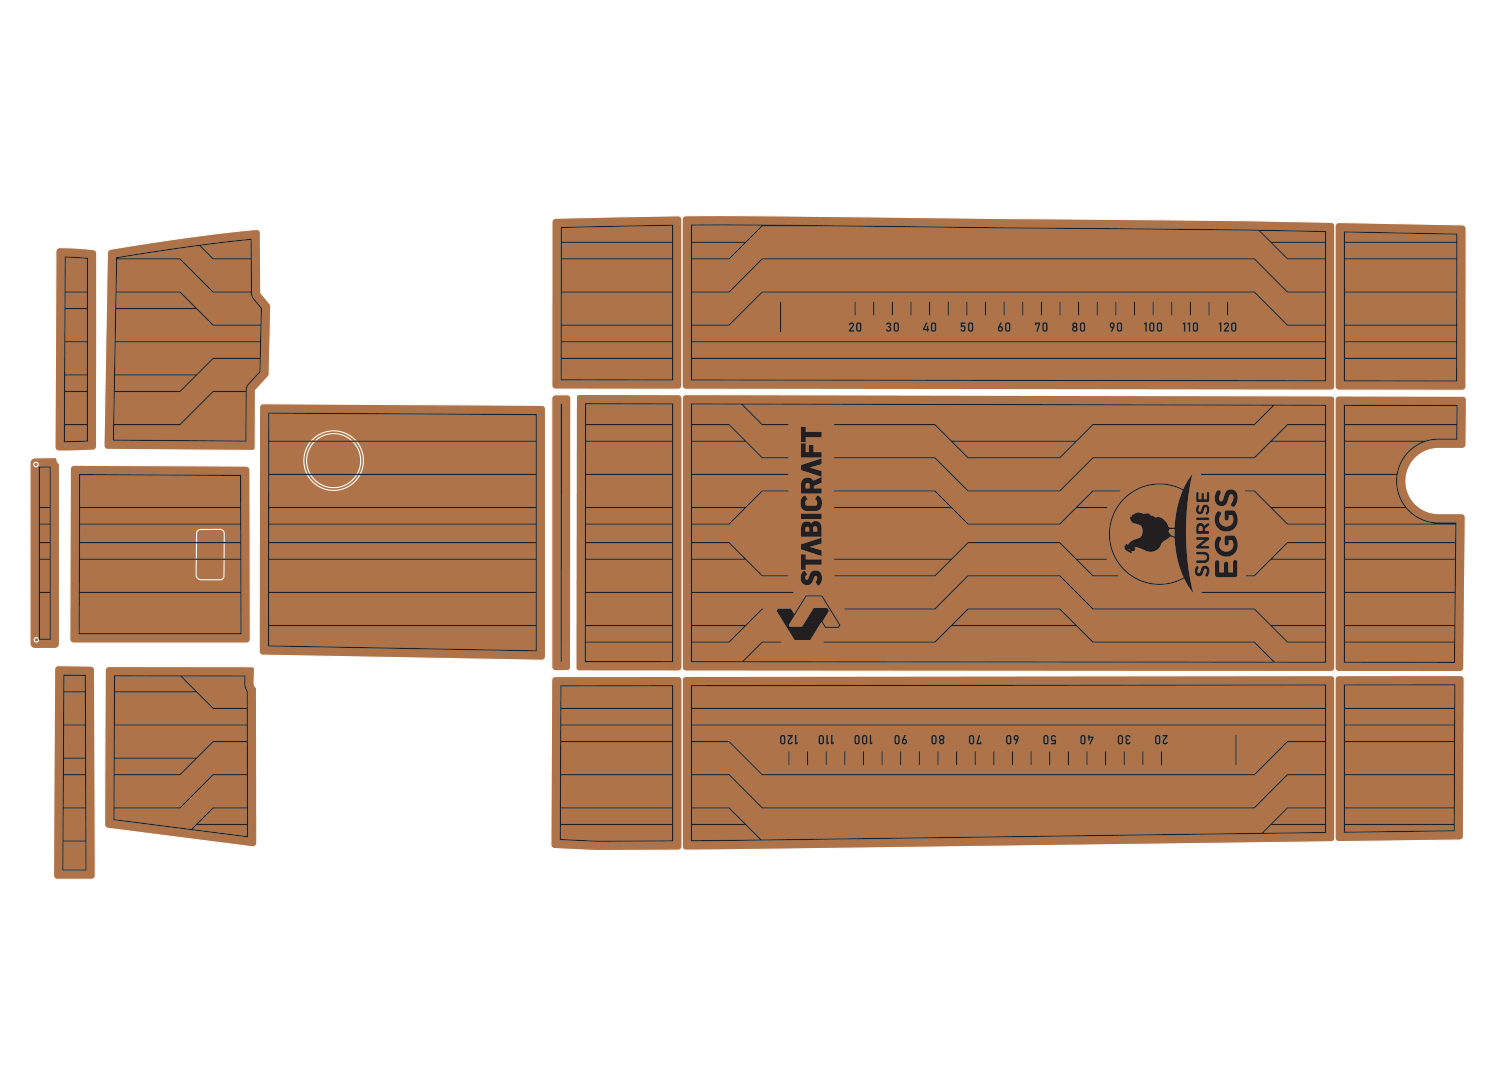 Stabicraft 2400 udek boat flooring